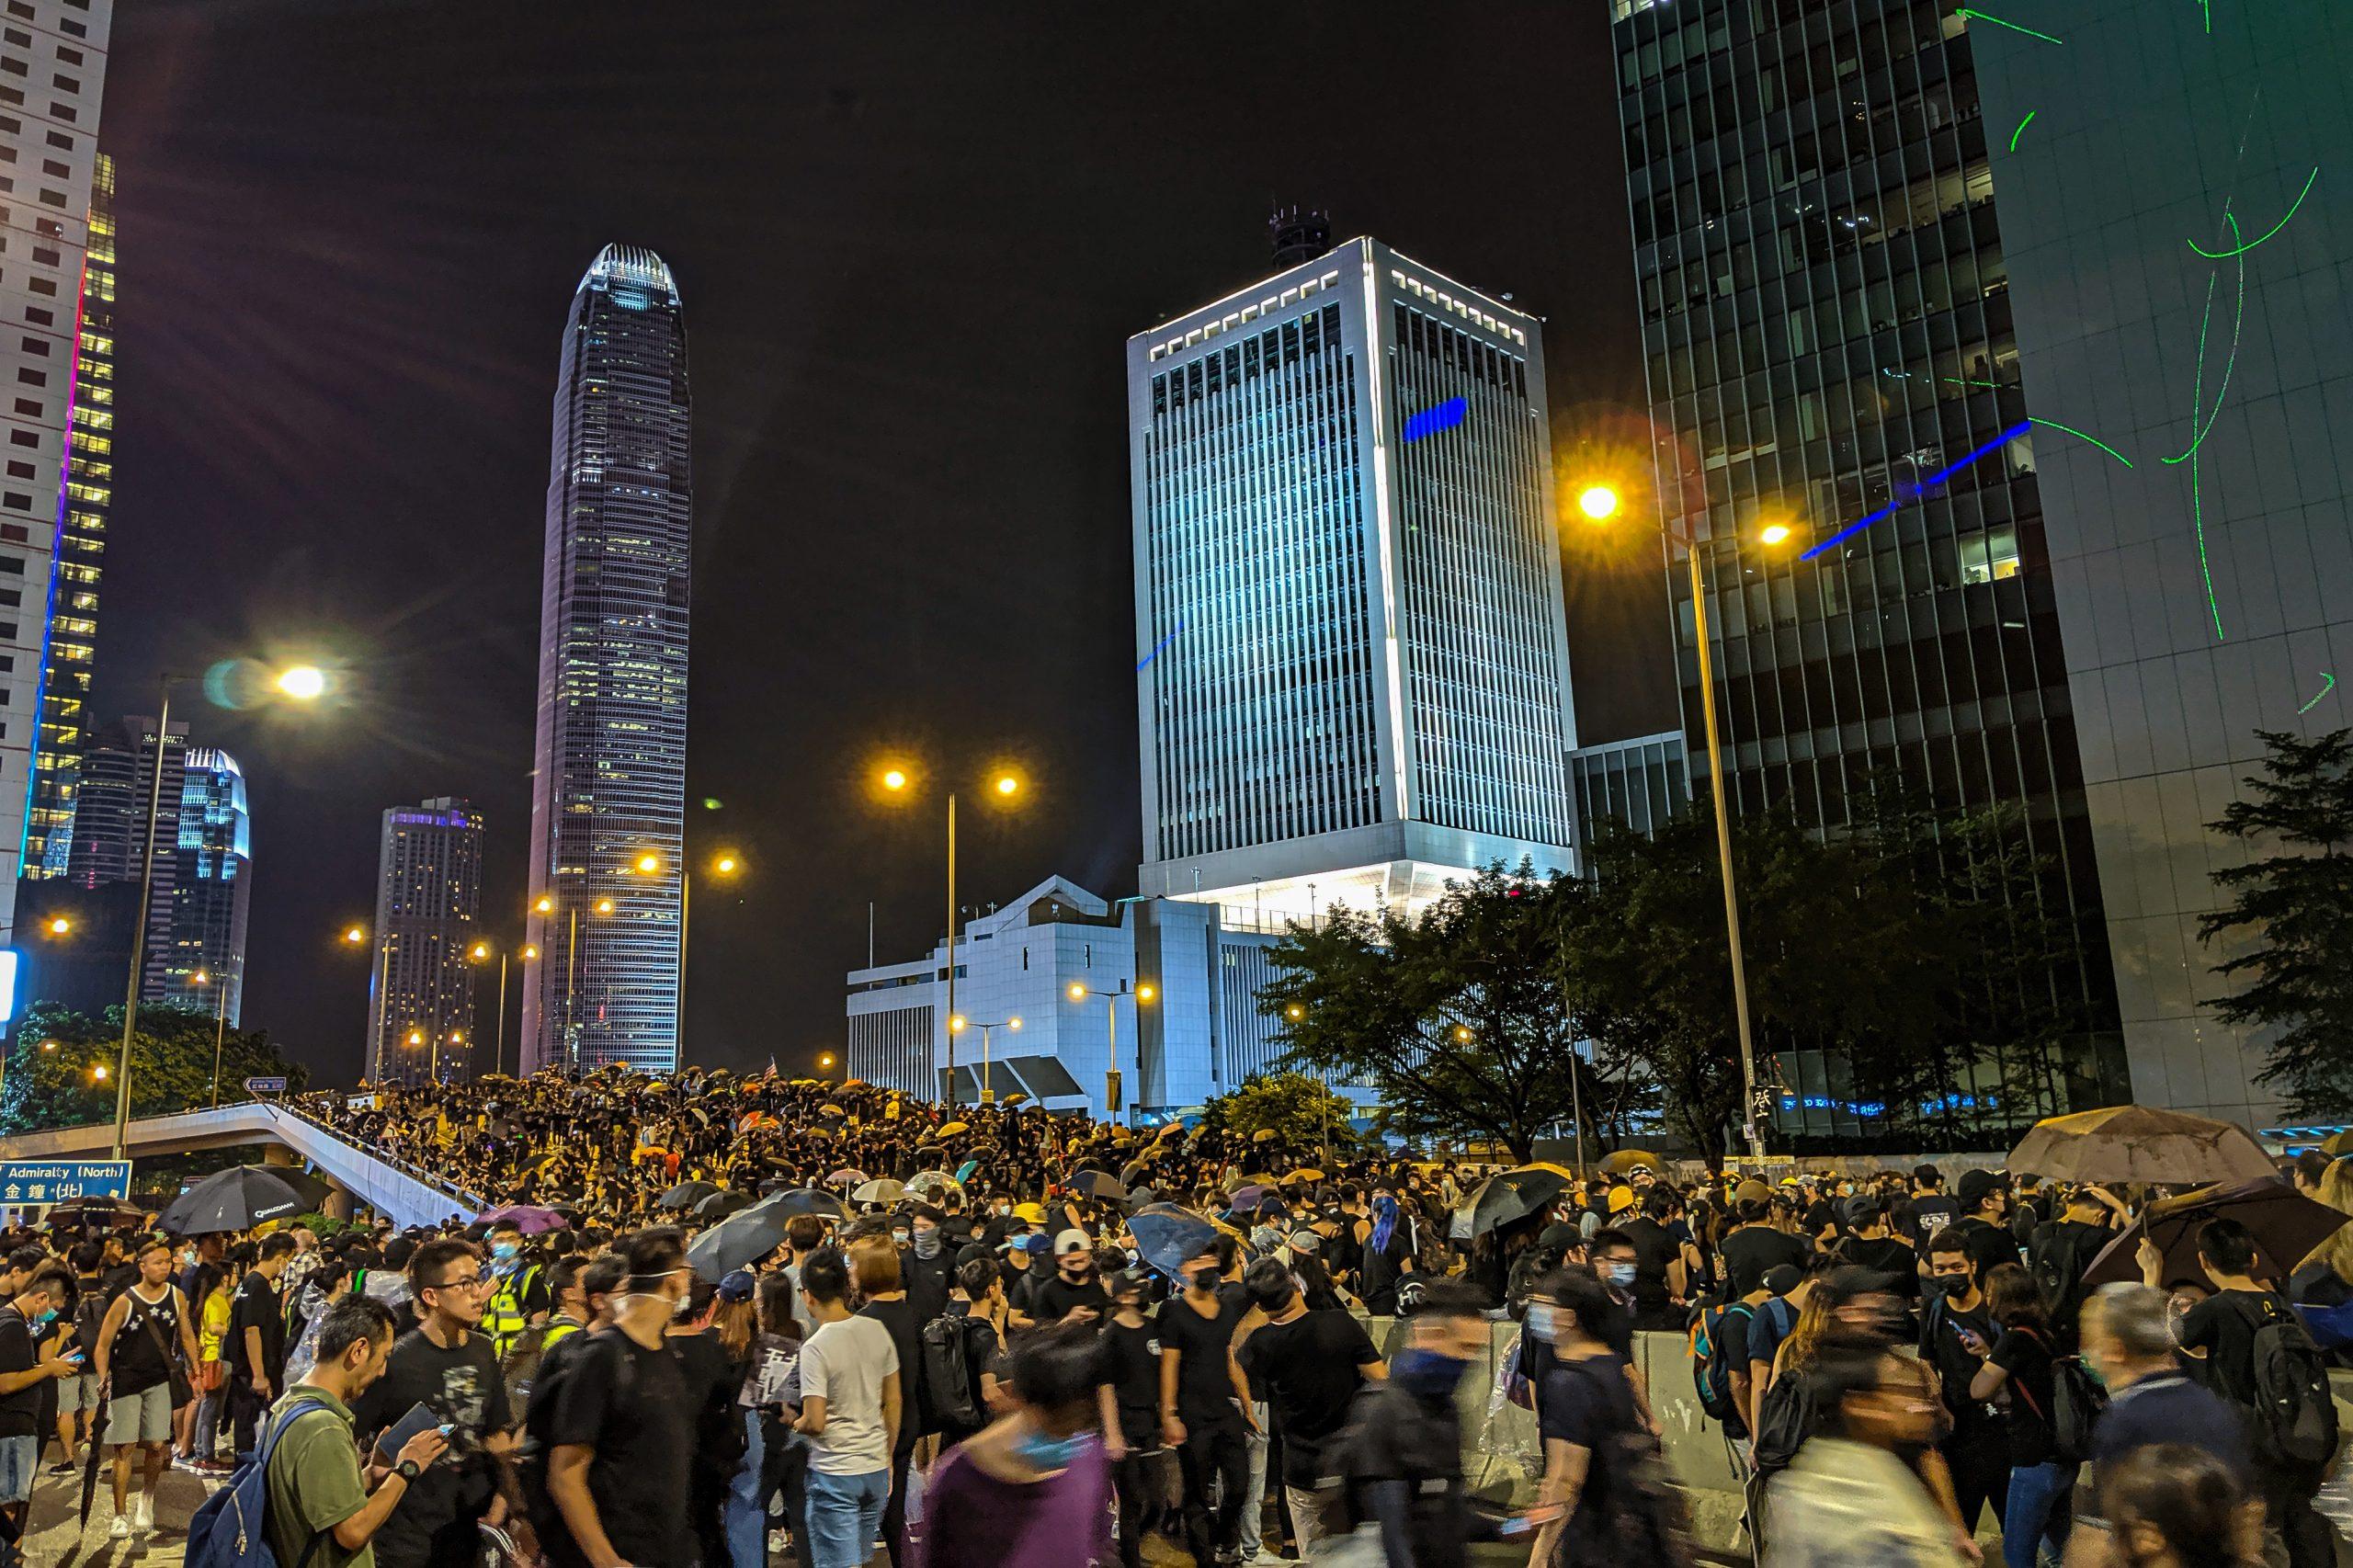 Hong Kong protests, photo: Studio Incendo/CC BY 2.0